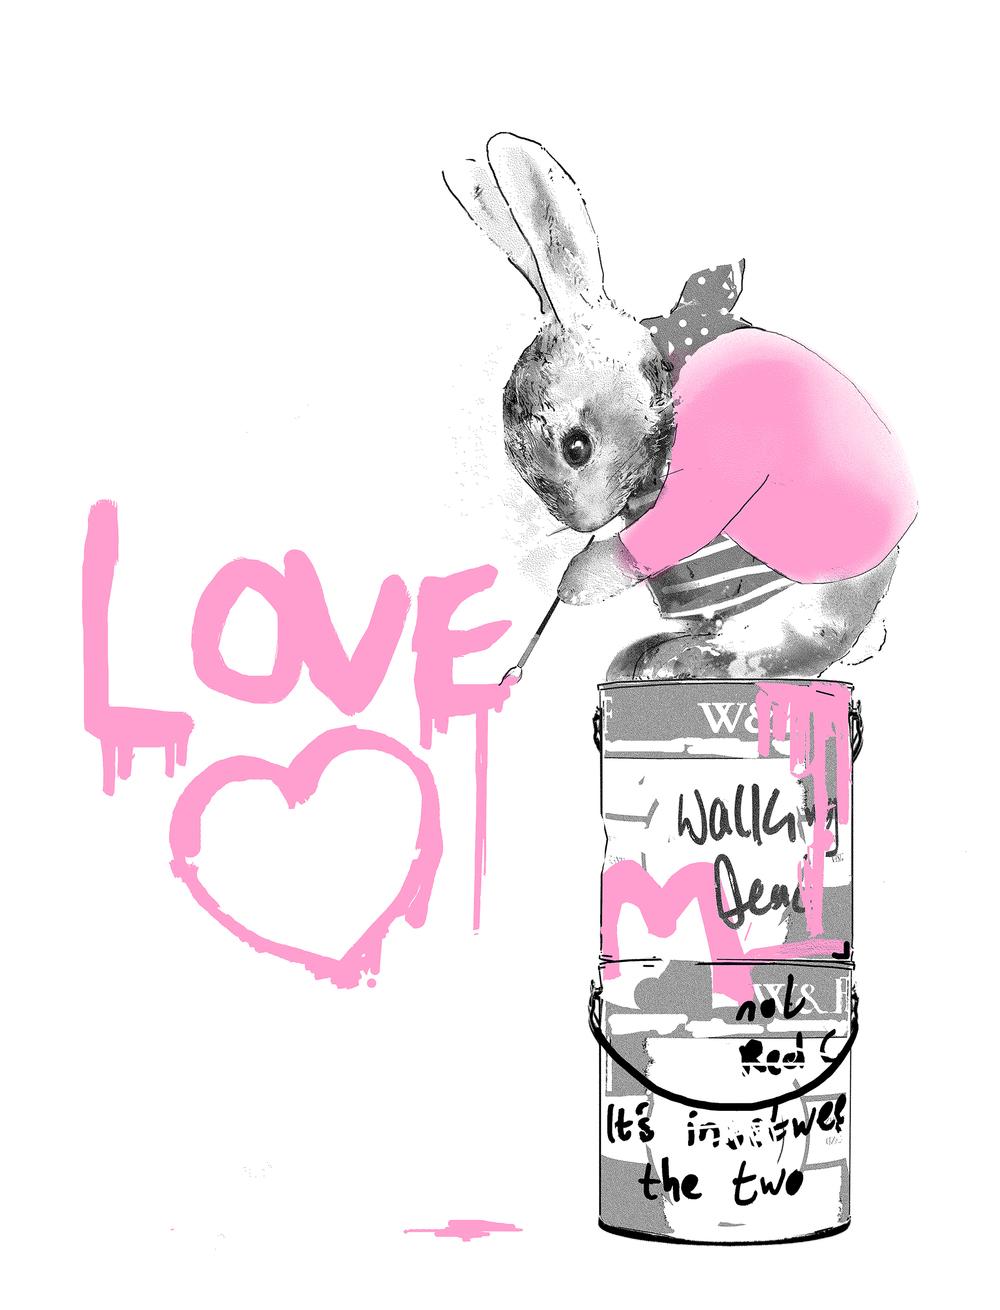 Harry Bunce - Making Love #2 (Pink)